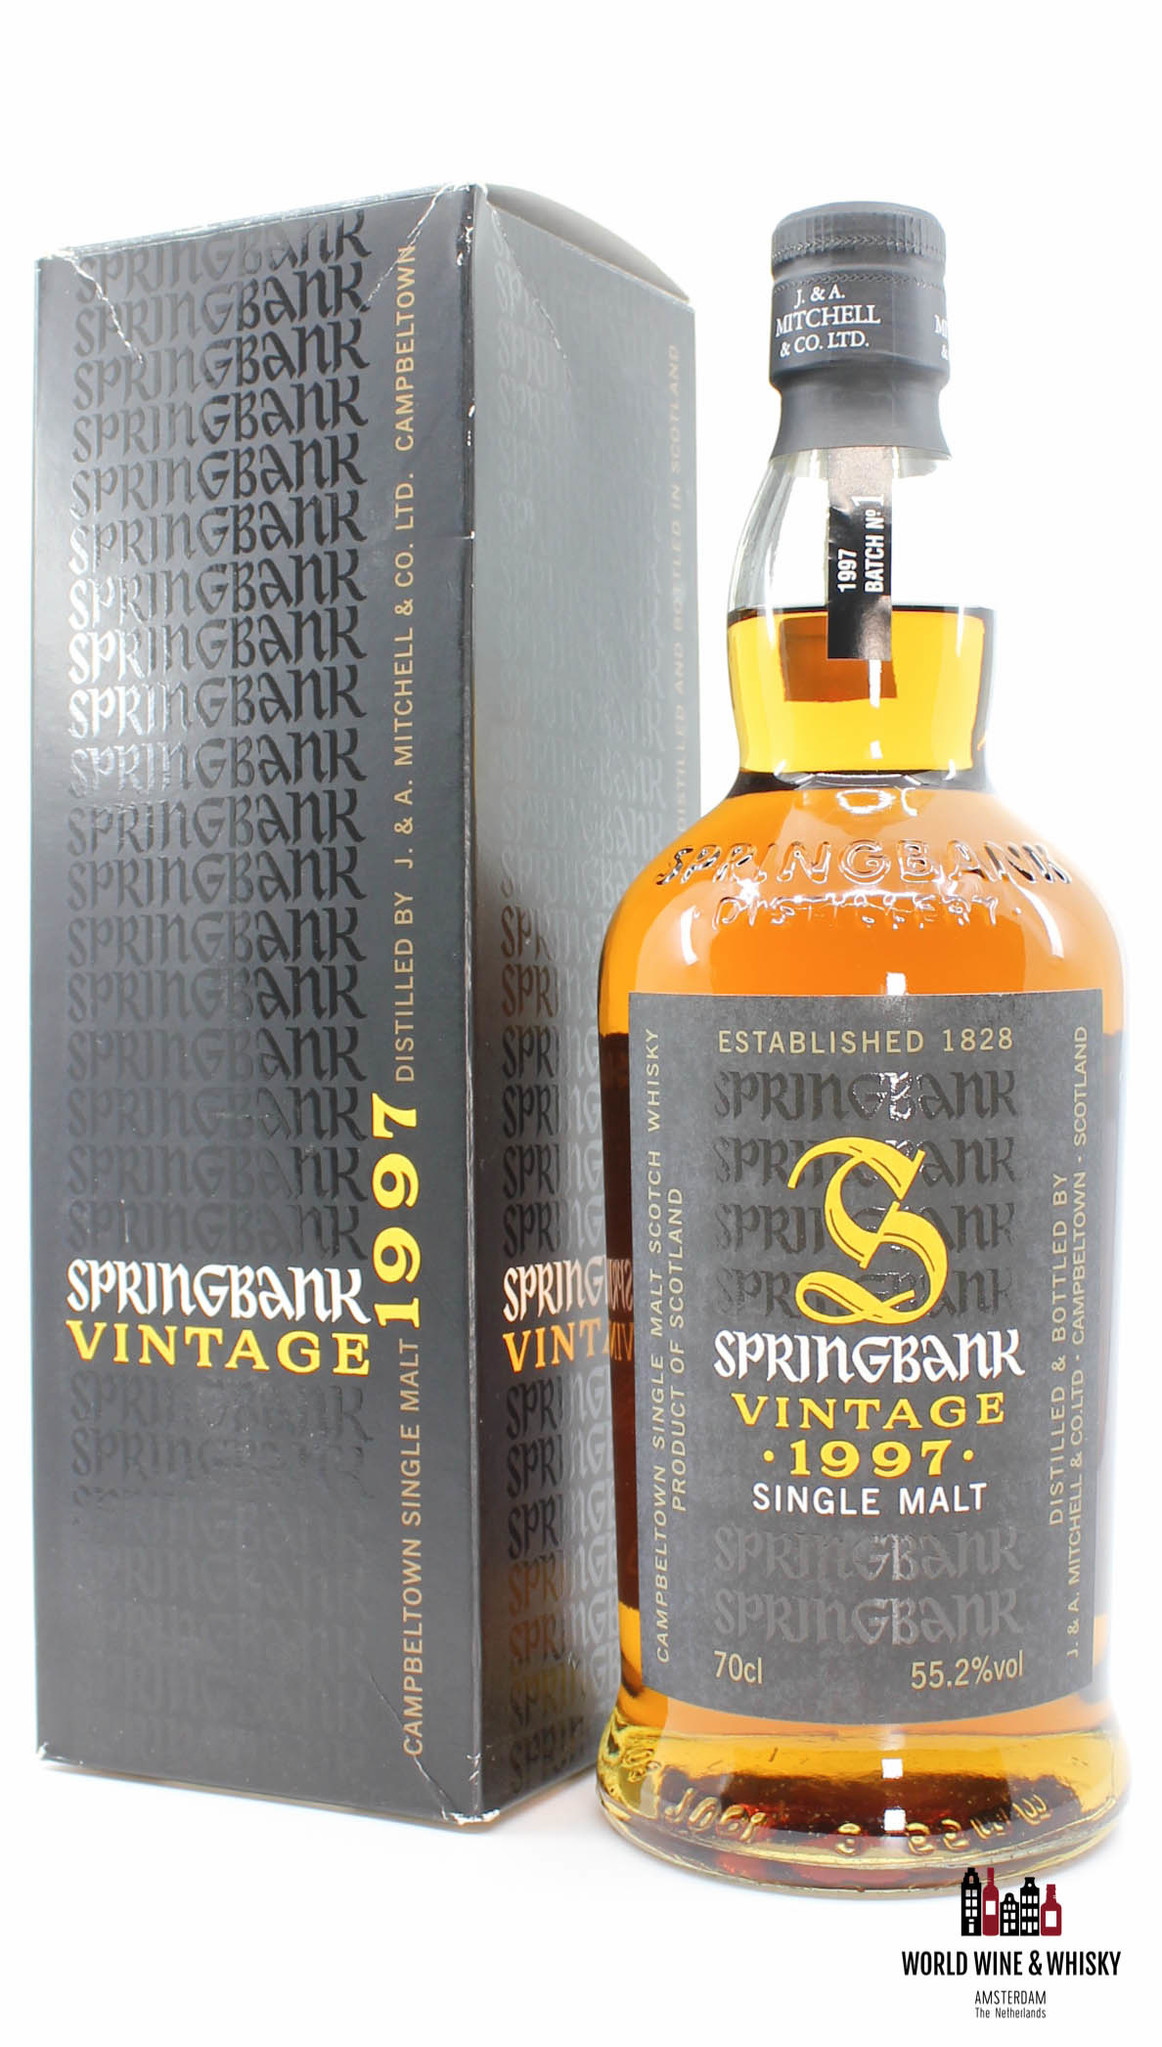 Springbank Springbank 10 Years Old 1997 2007 Vintage - Batch No. 1 - 55.2%